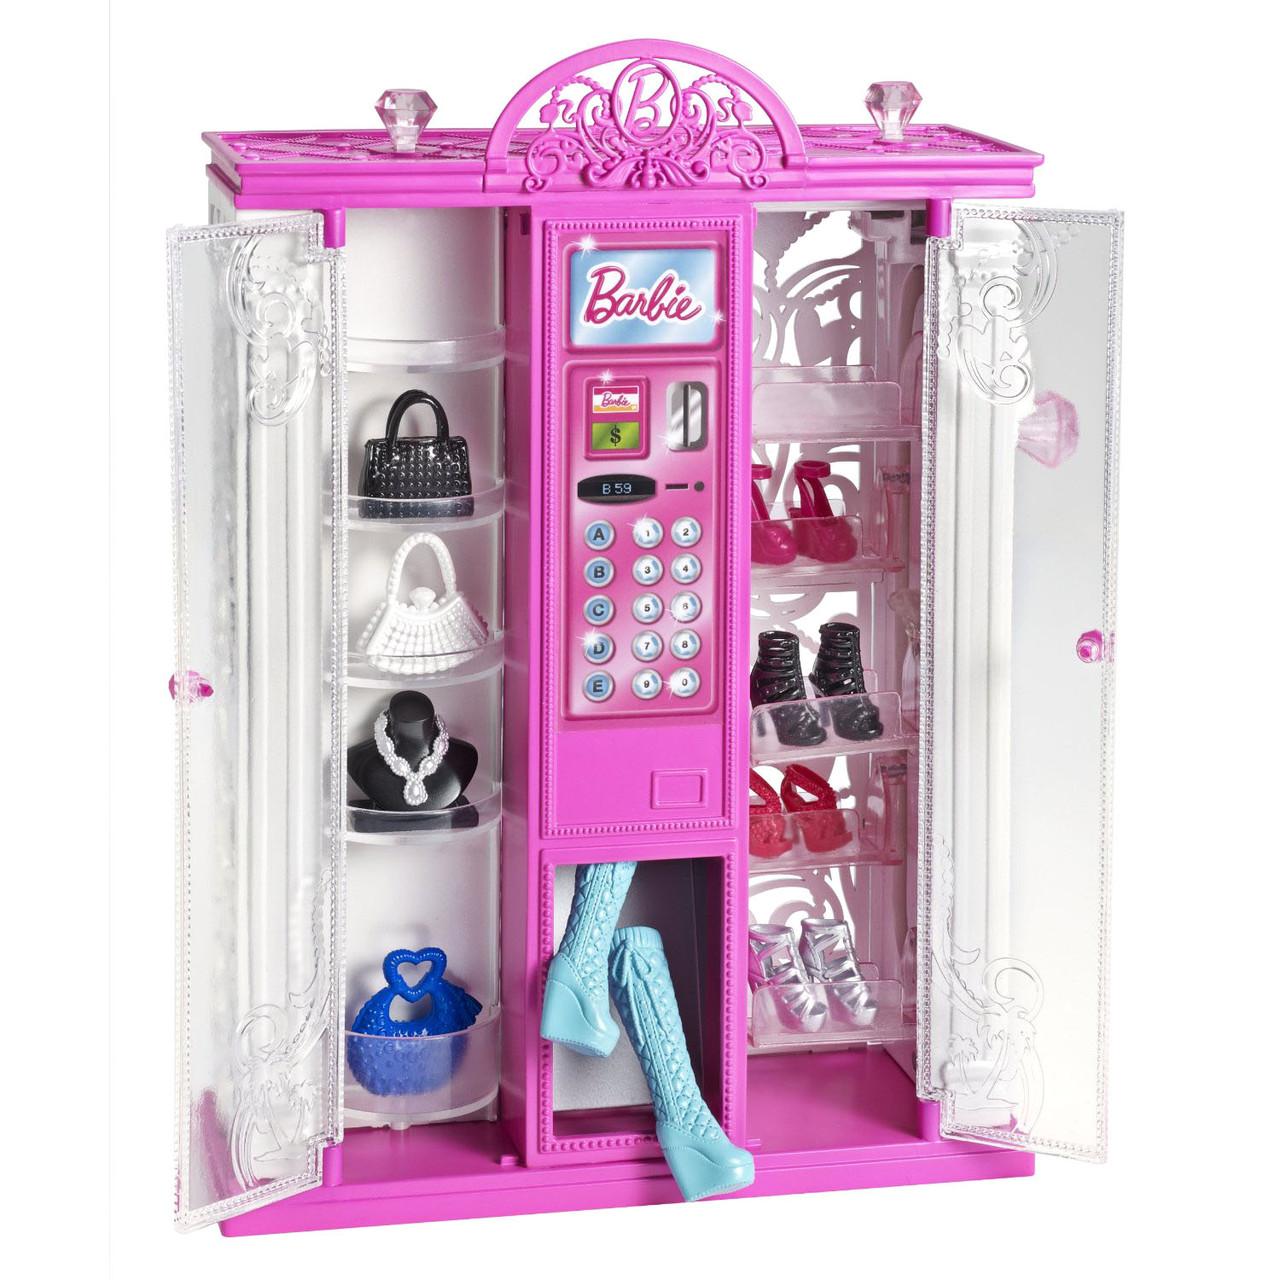 "Автомат с аксессуарами для Барби серии ""Дом мечты"" Barbie (Автомат з аксесуарами  серії Будинок мрії)"